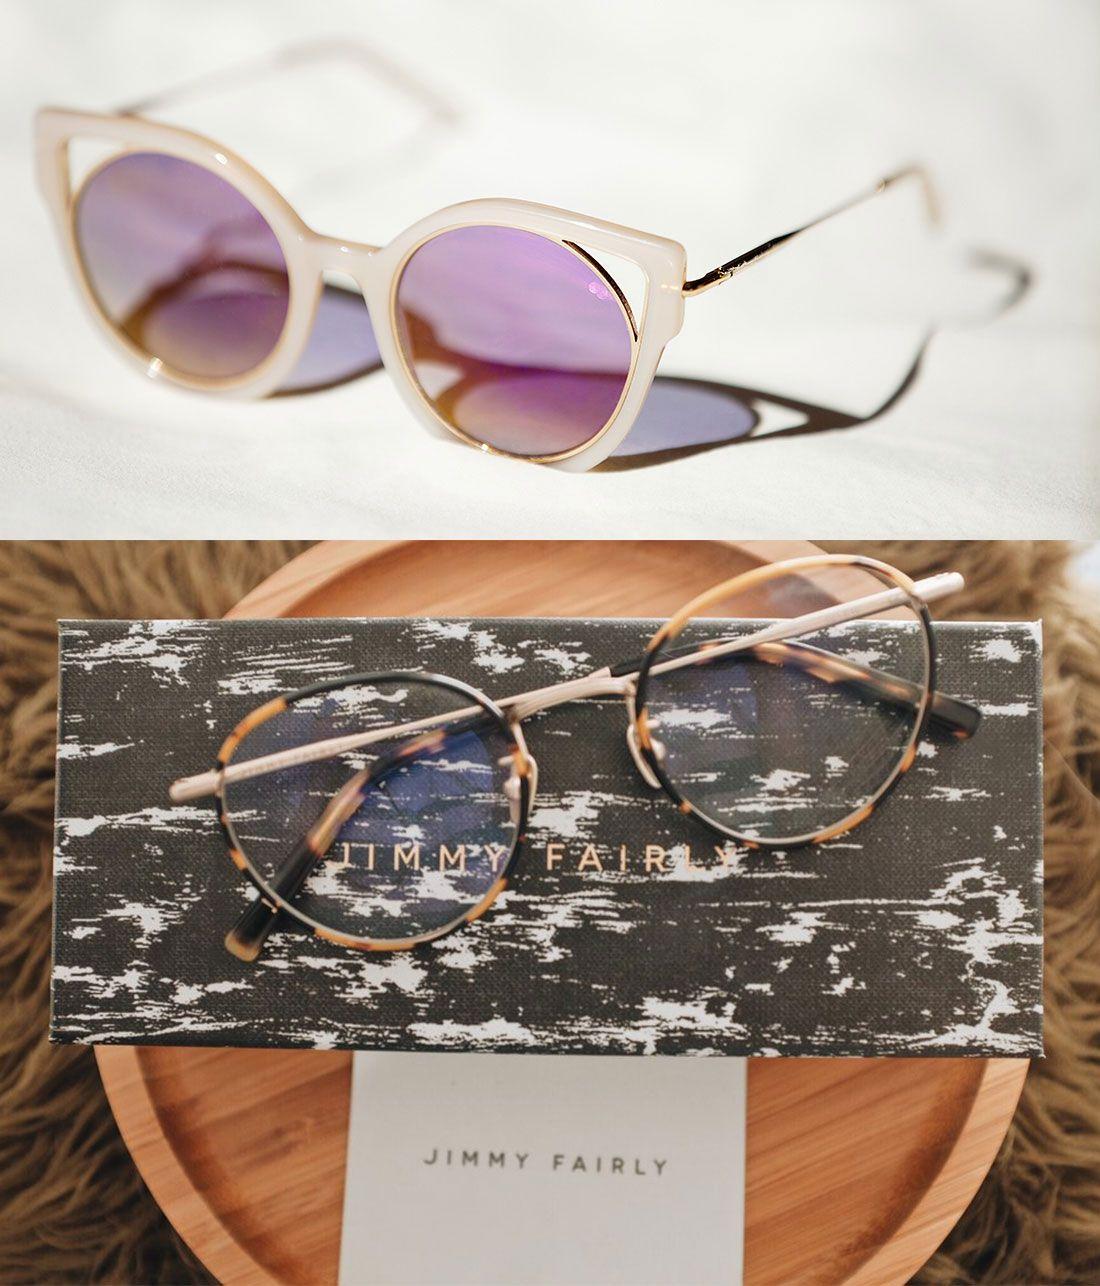 Jimmy Fairly French high fashion eyewear without the